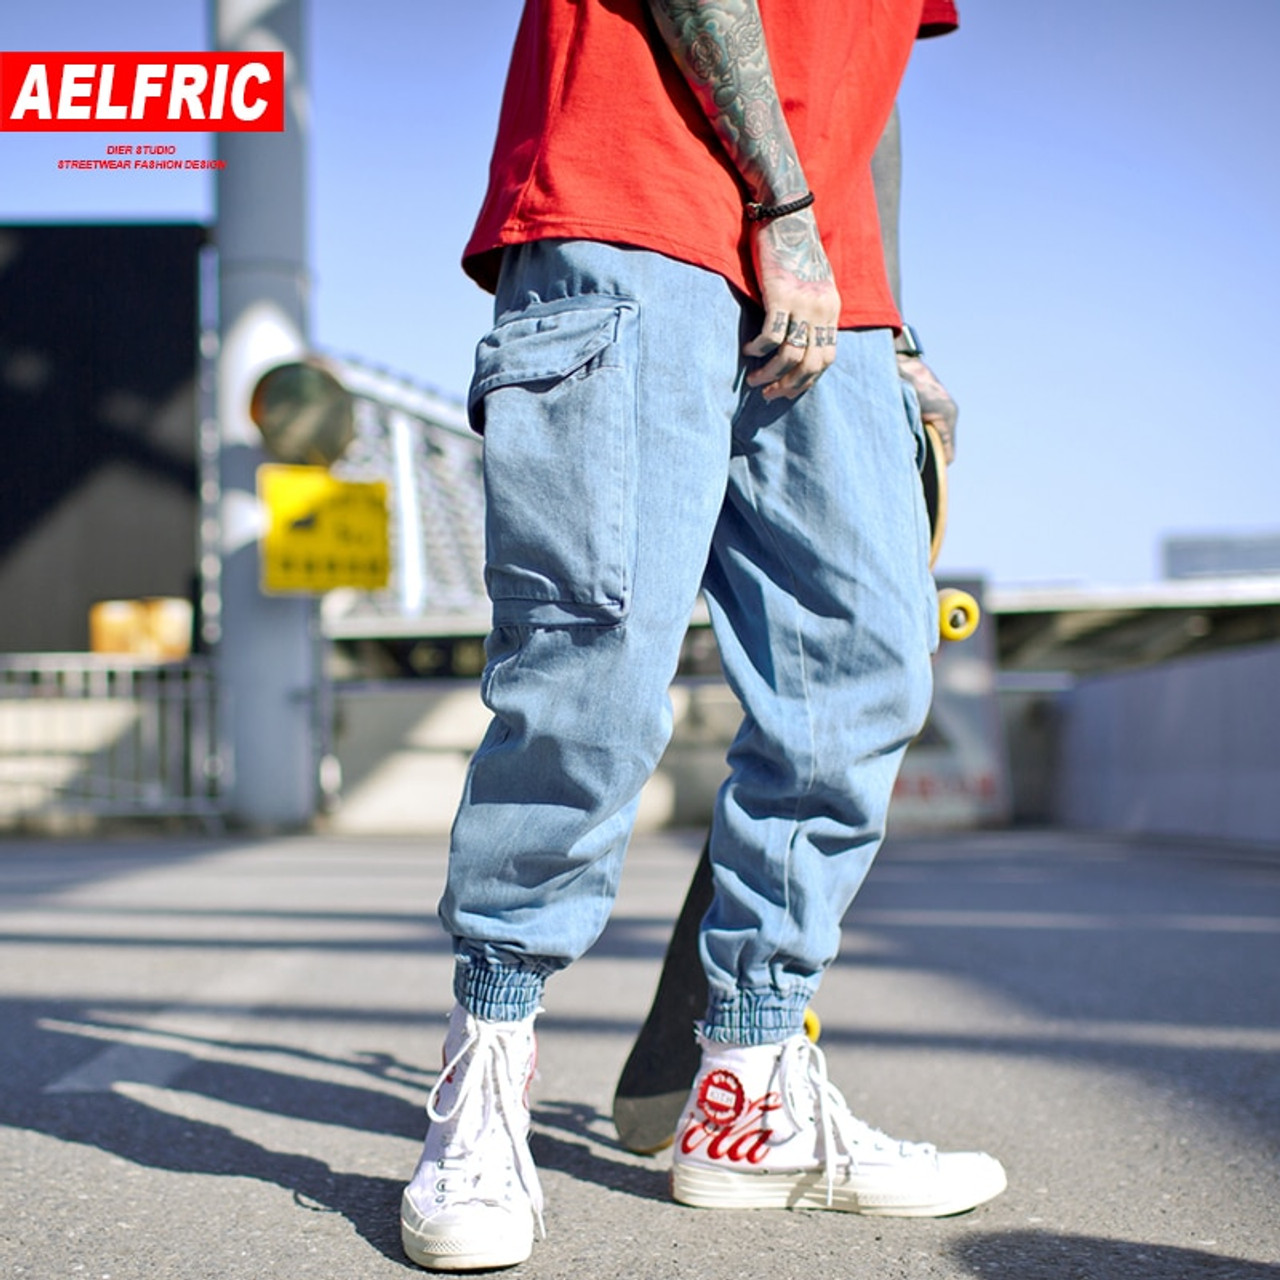 bc5b136b5b9 AELFRIC Harem Pants Men Side Pockets Cargo Sweatpants Cotton Denim Jean  Trousers Elastic Waist Hip Hop ...